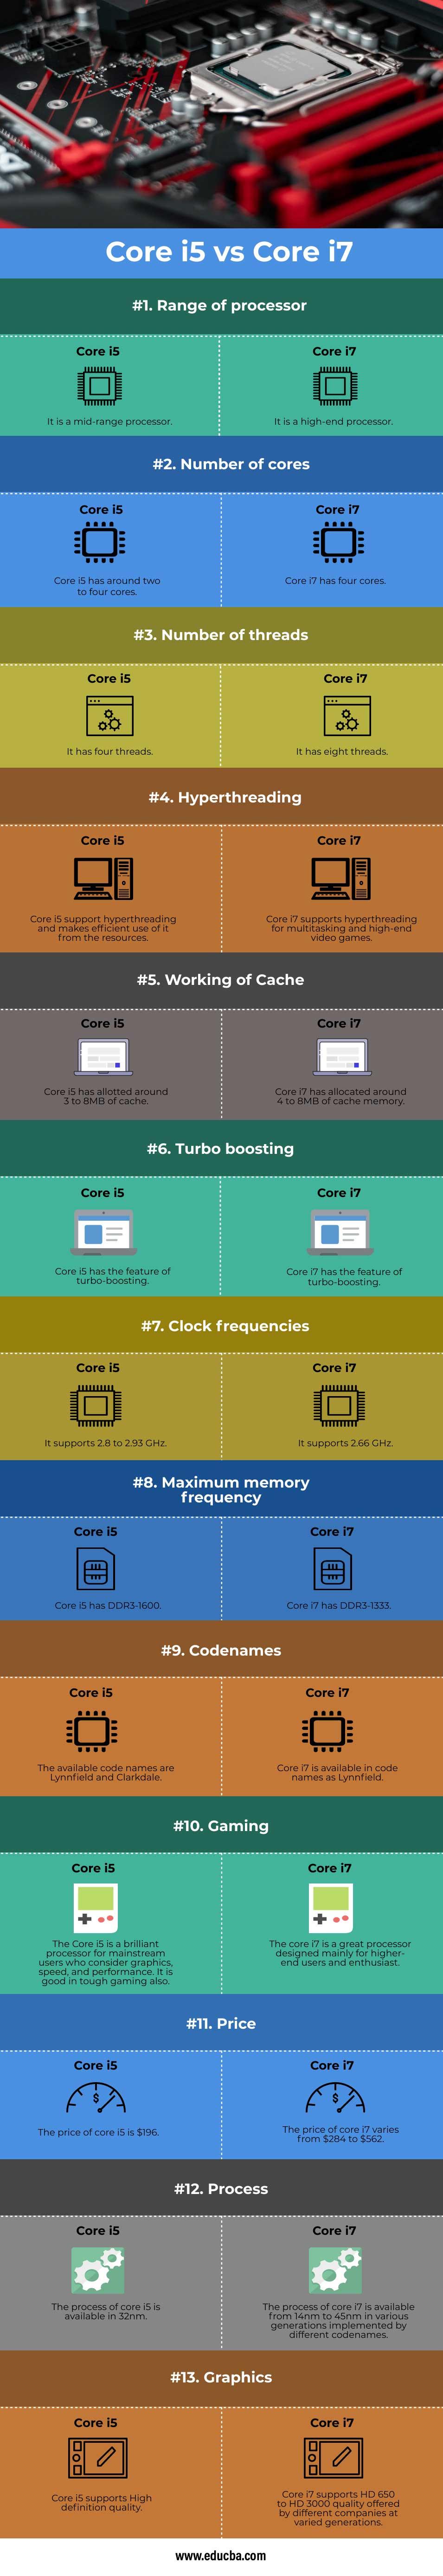 Core-i5-vs-Core-i7-info